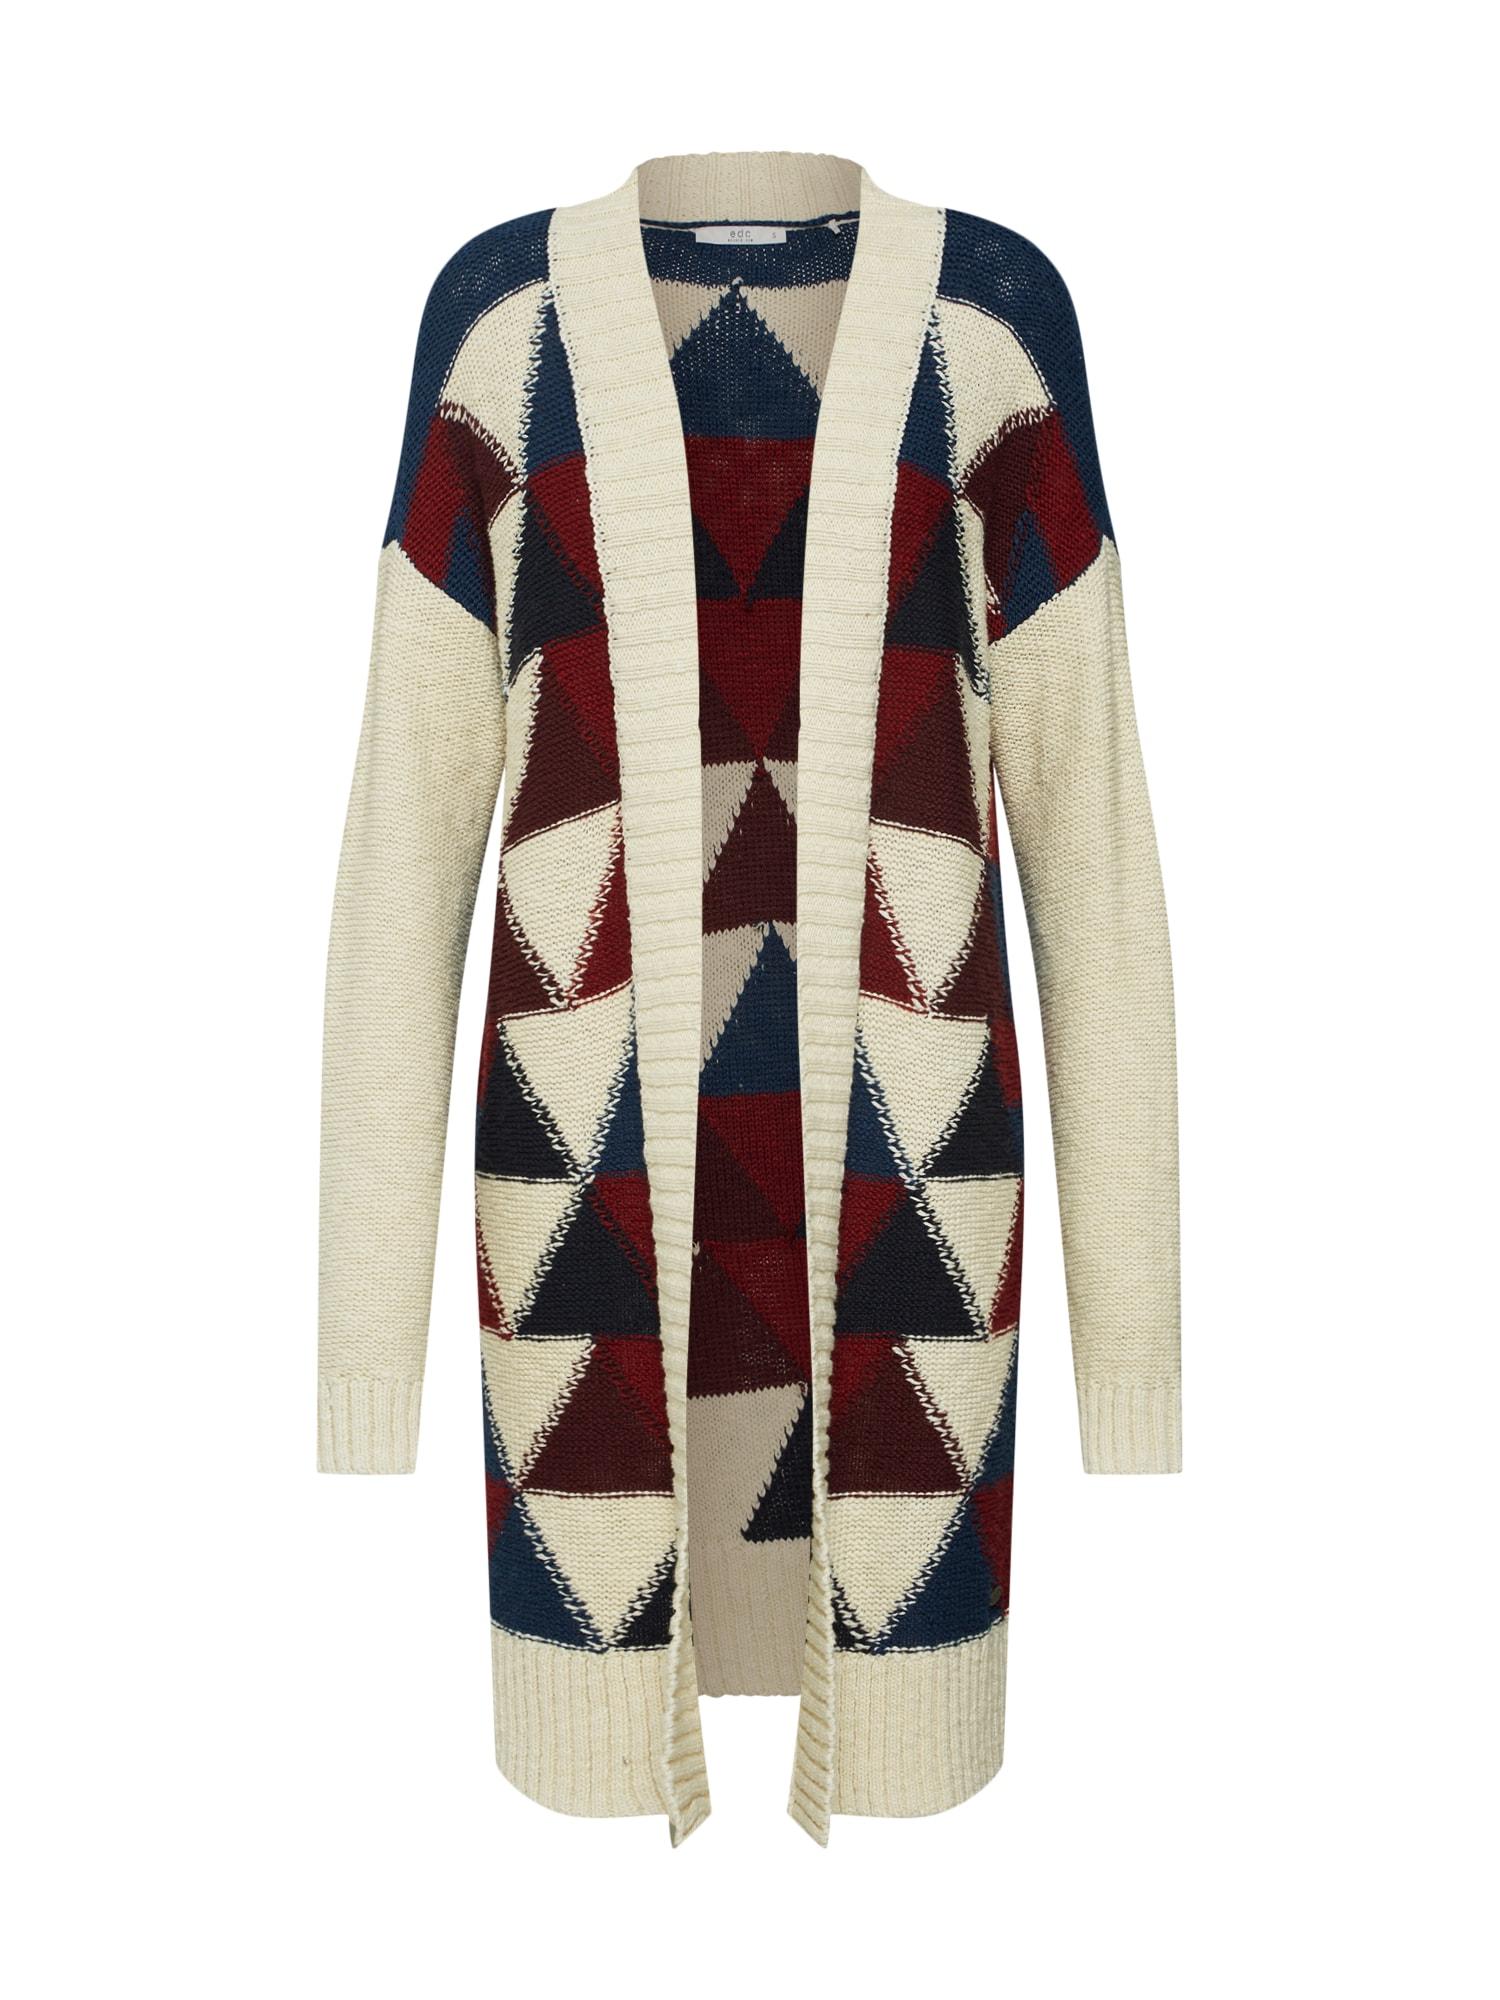 Kardigan geometrical jaq Sweaters cardigan krémová tmavě modrá červená EDC BY ESPRIT